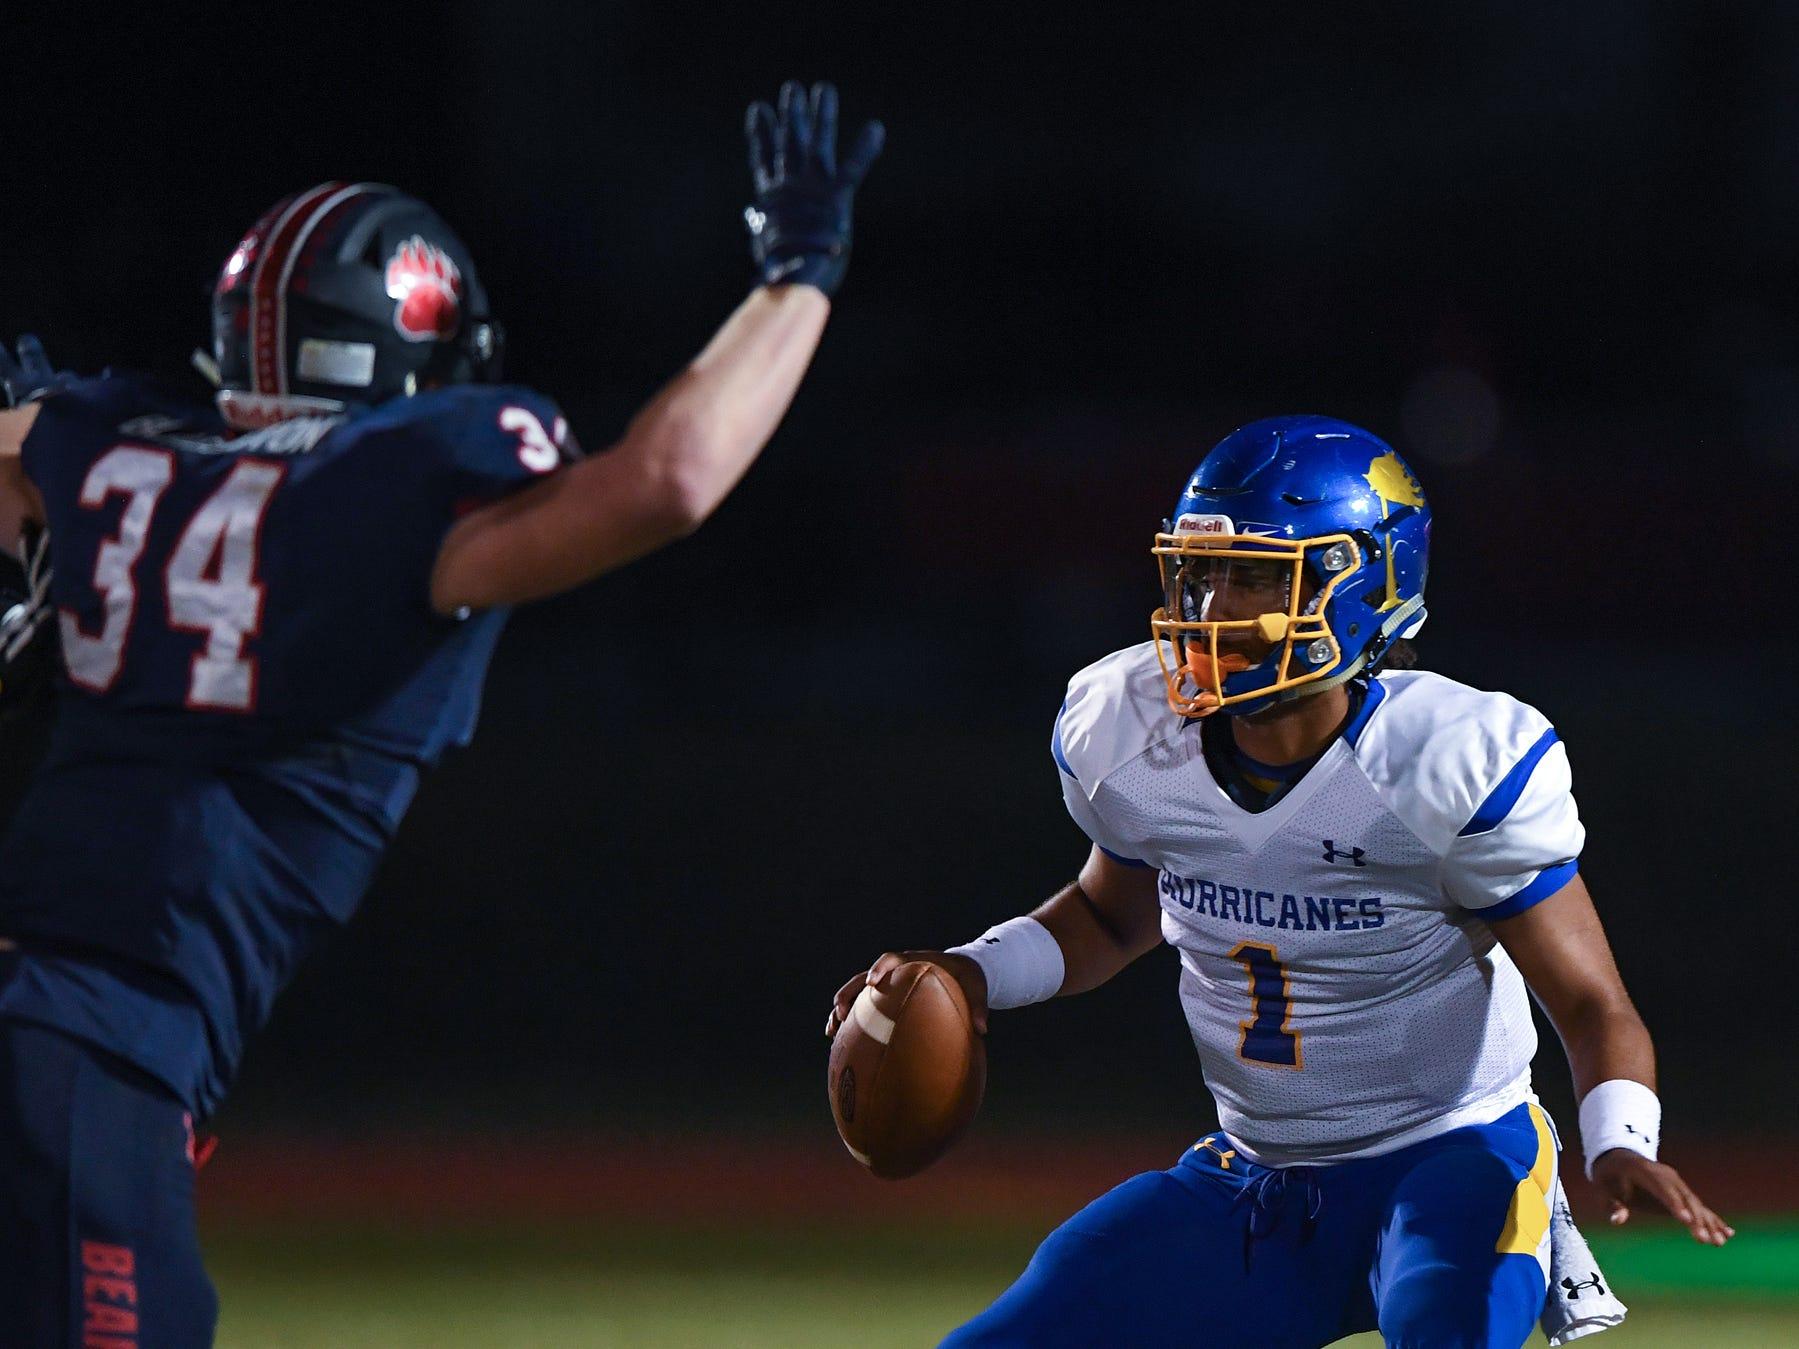 Wren quarterback Tyrell Jackson (1) plays against Belton-Honea Path Friday, October 19, 2018 at Belton Honea Path's Marlee Gambrell Field.